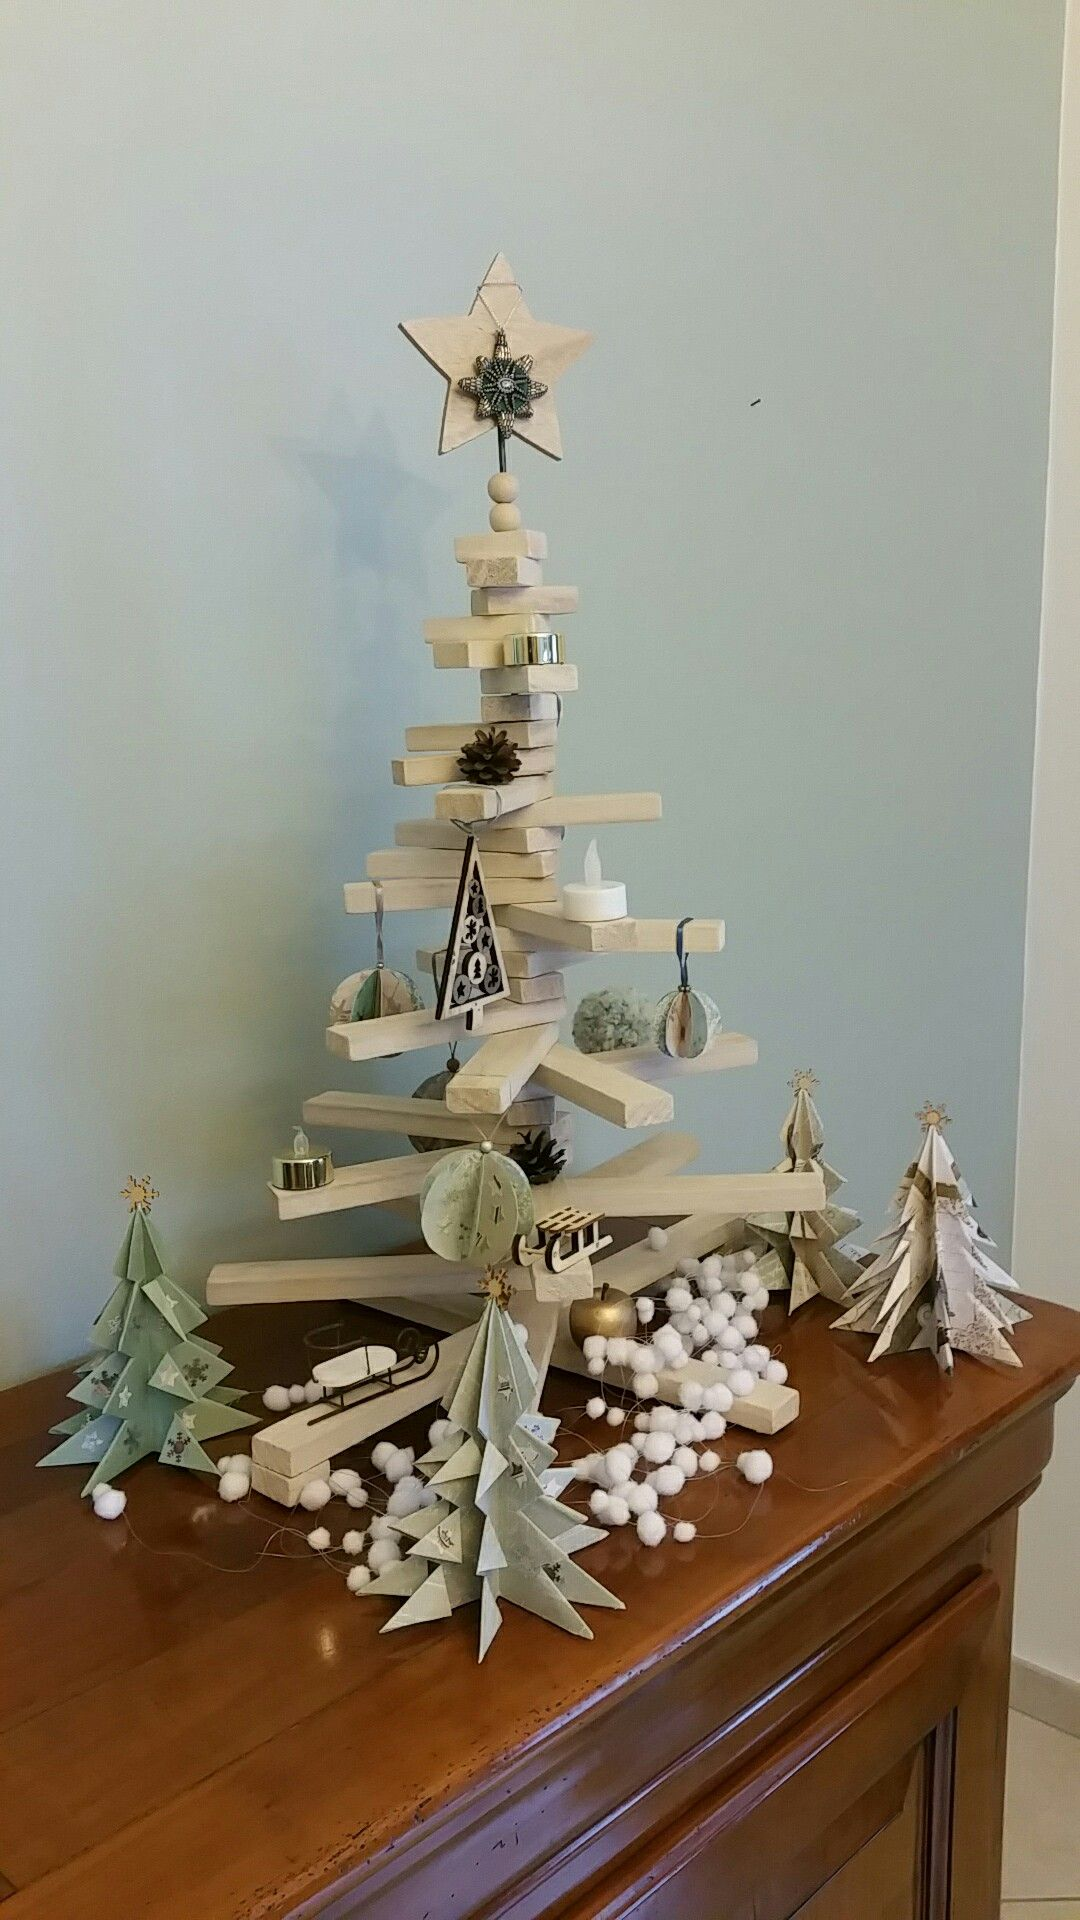 Forêt Noël diy Diy noël, Noel, Deco